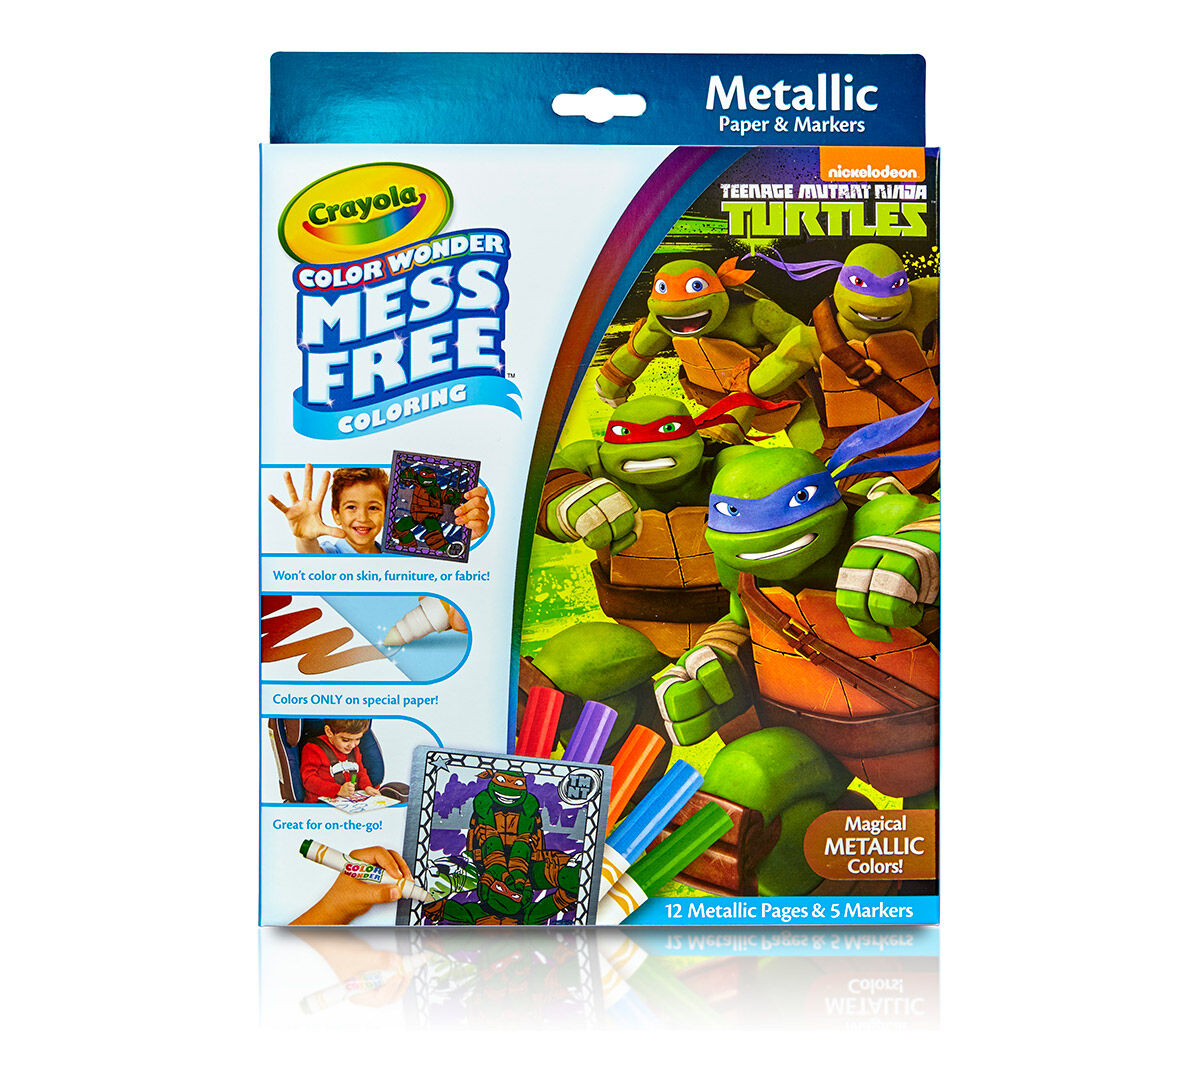 Color Wonder Metallic Paper Markers